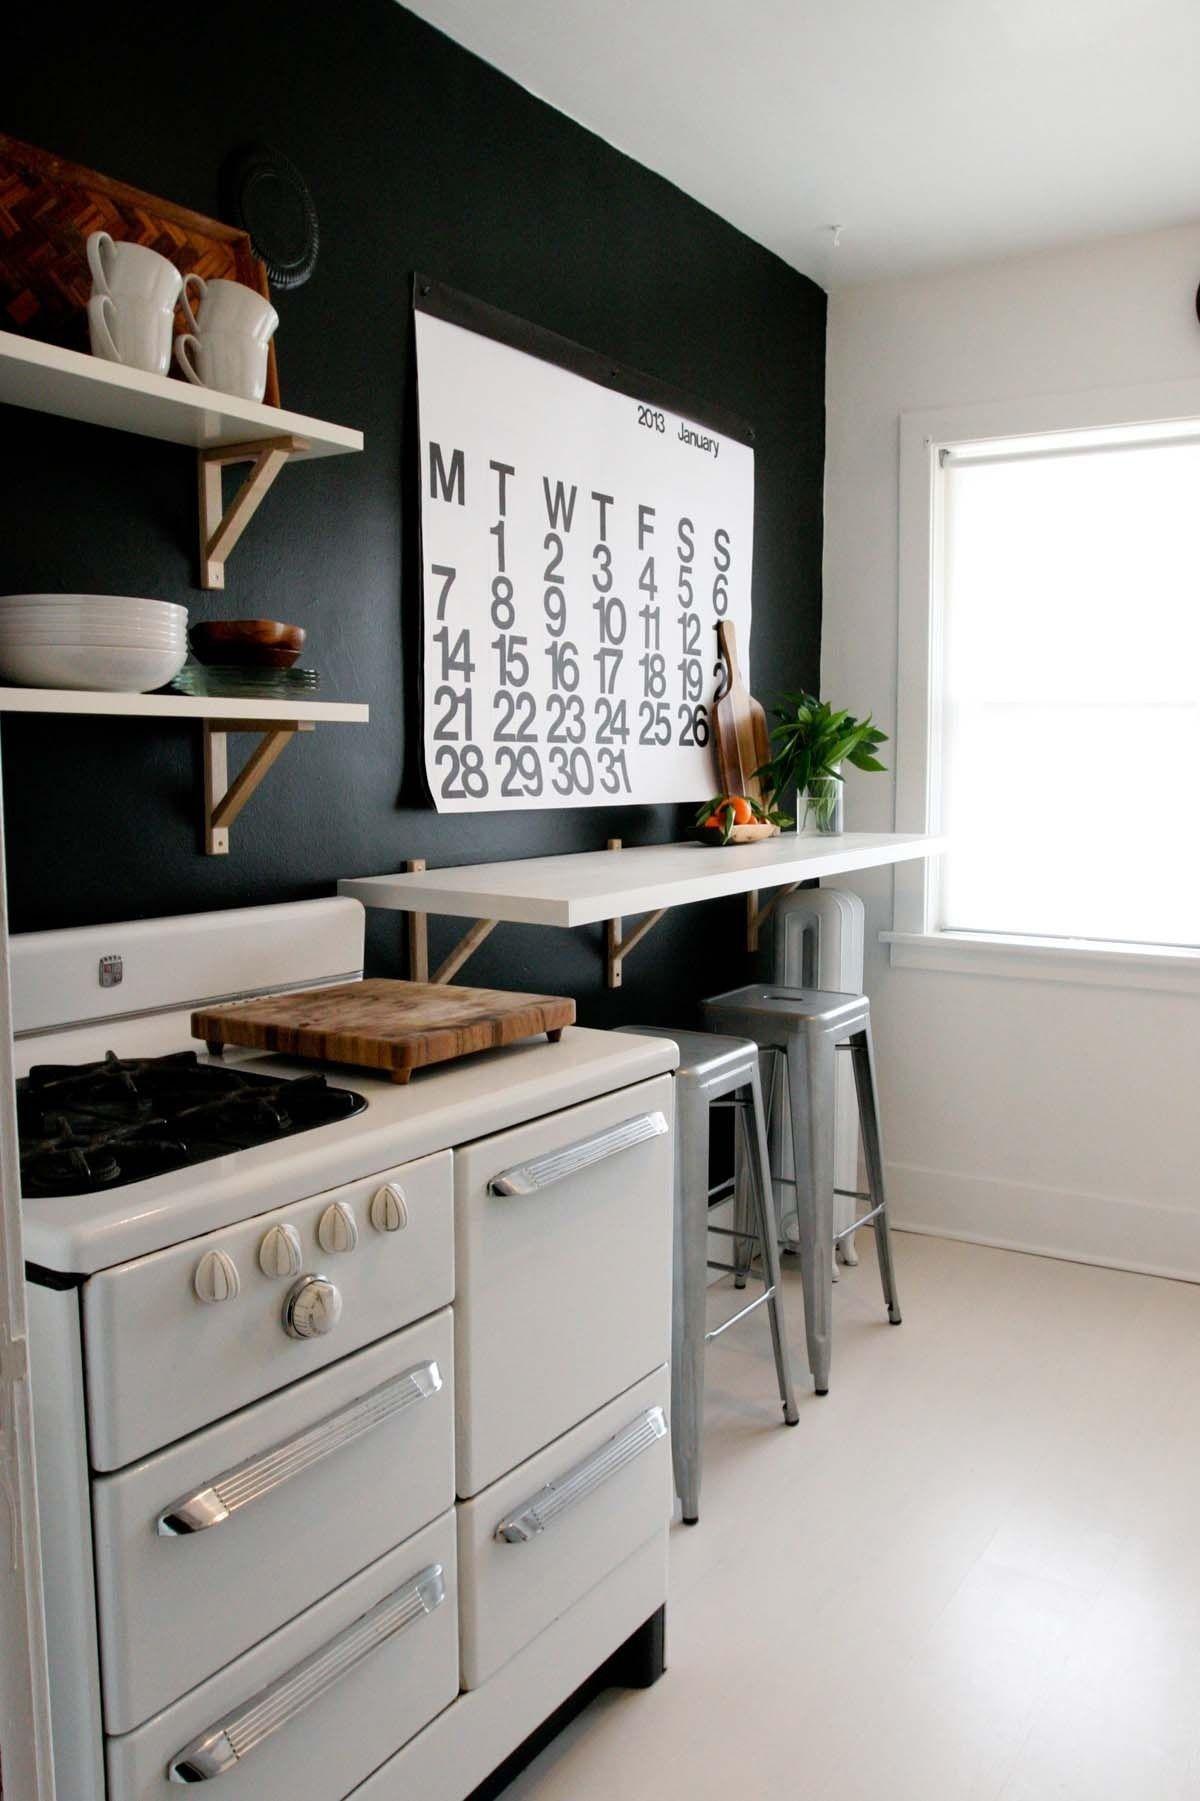 simple vintage kitchen / black suede accent walls http://www.thekitchn.com/a-black-and-white-1920s-kitchen-kitchen-spotlight-184475